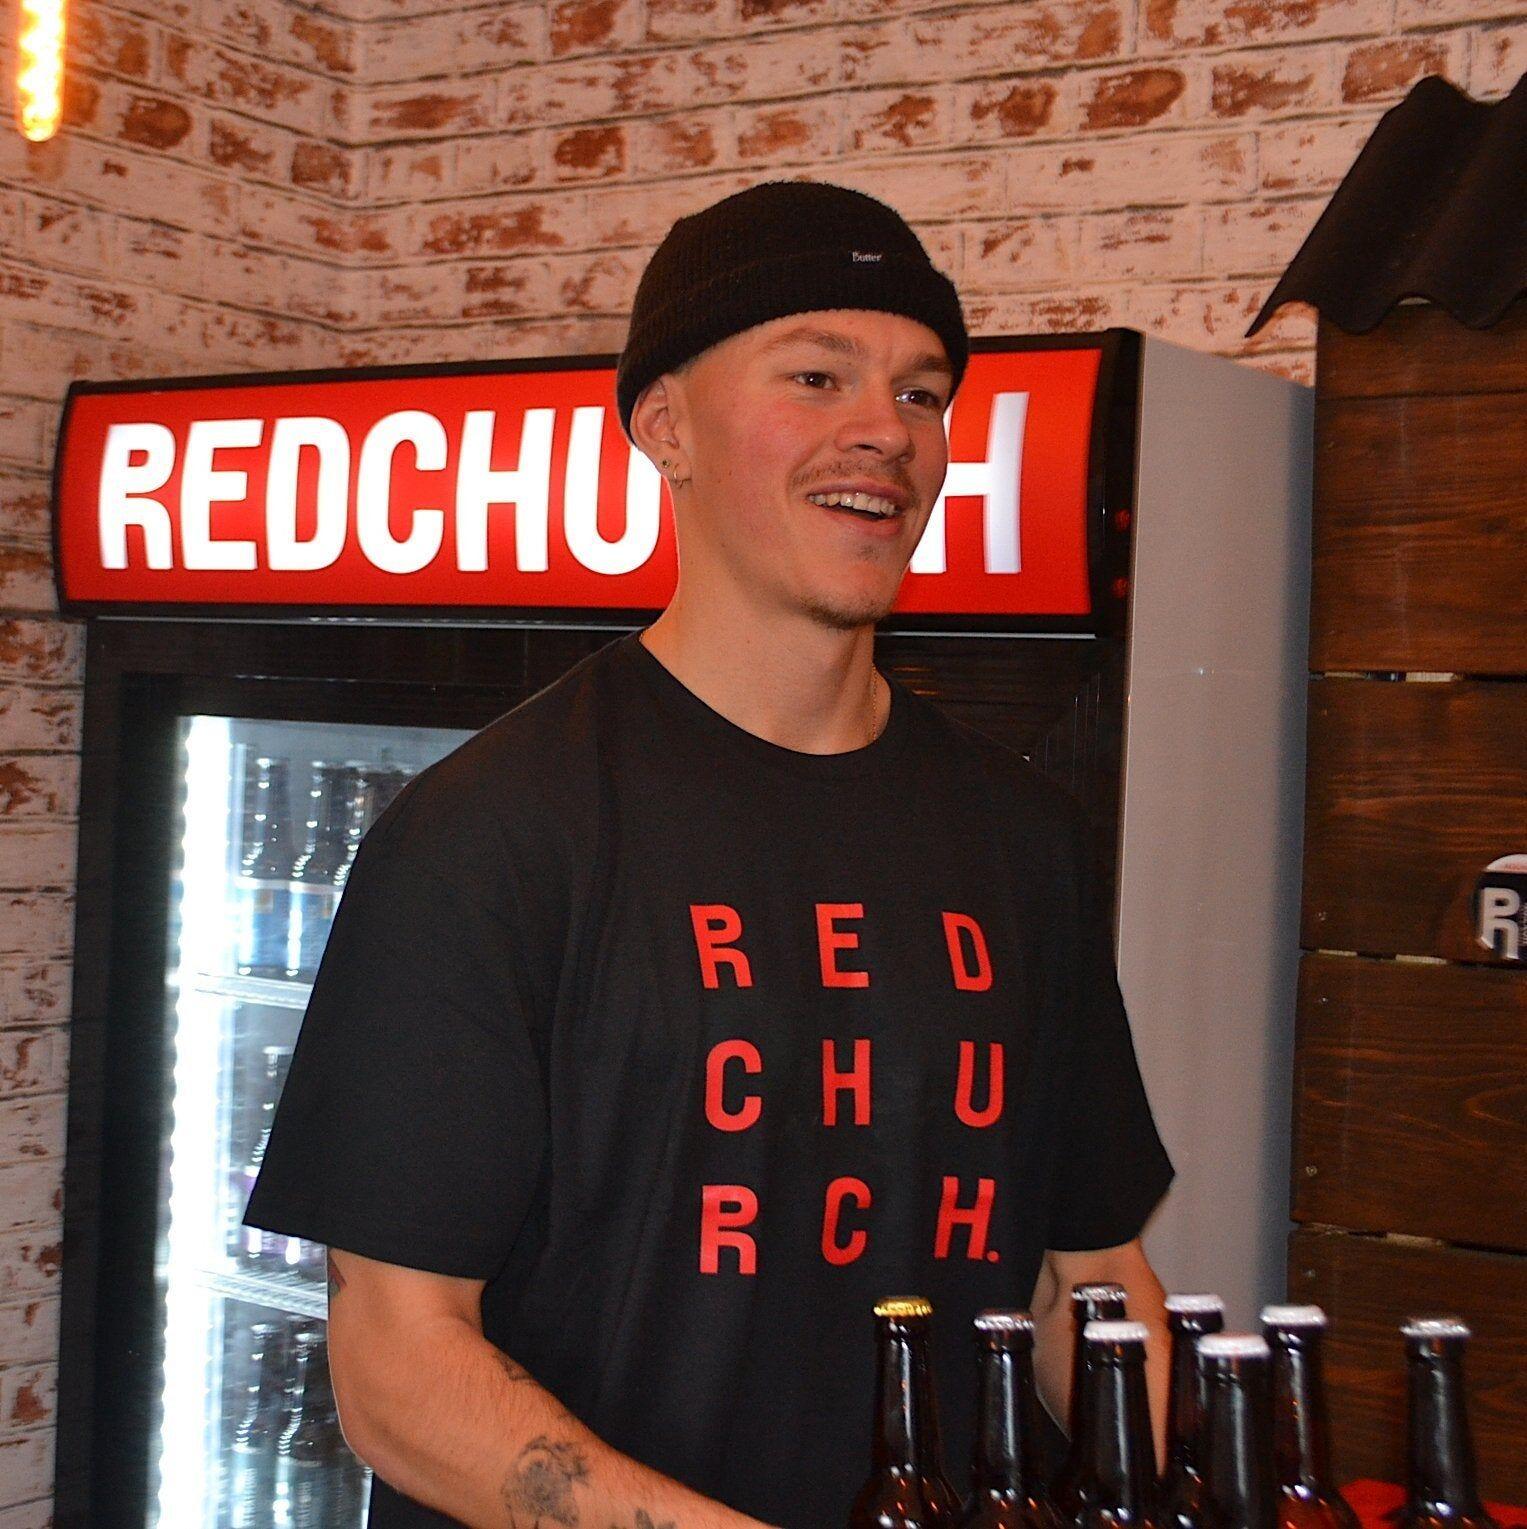 Redchurch Brewery Redchurch 9 Letter T-Shirt - XL 44-46